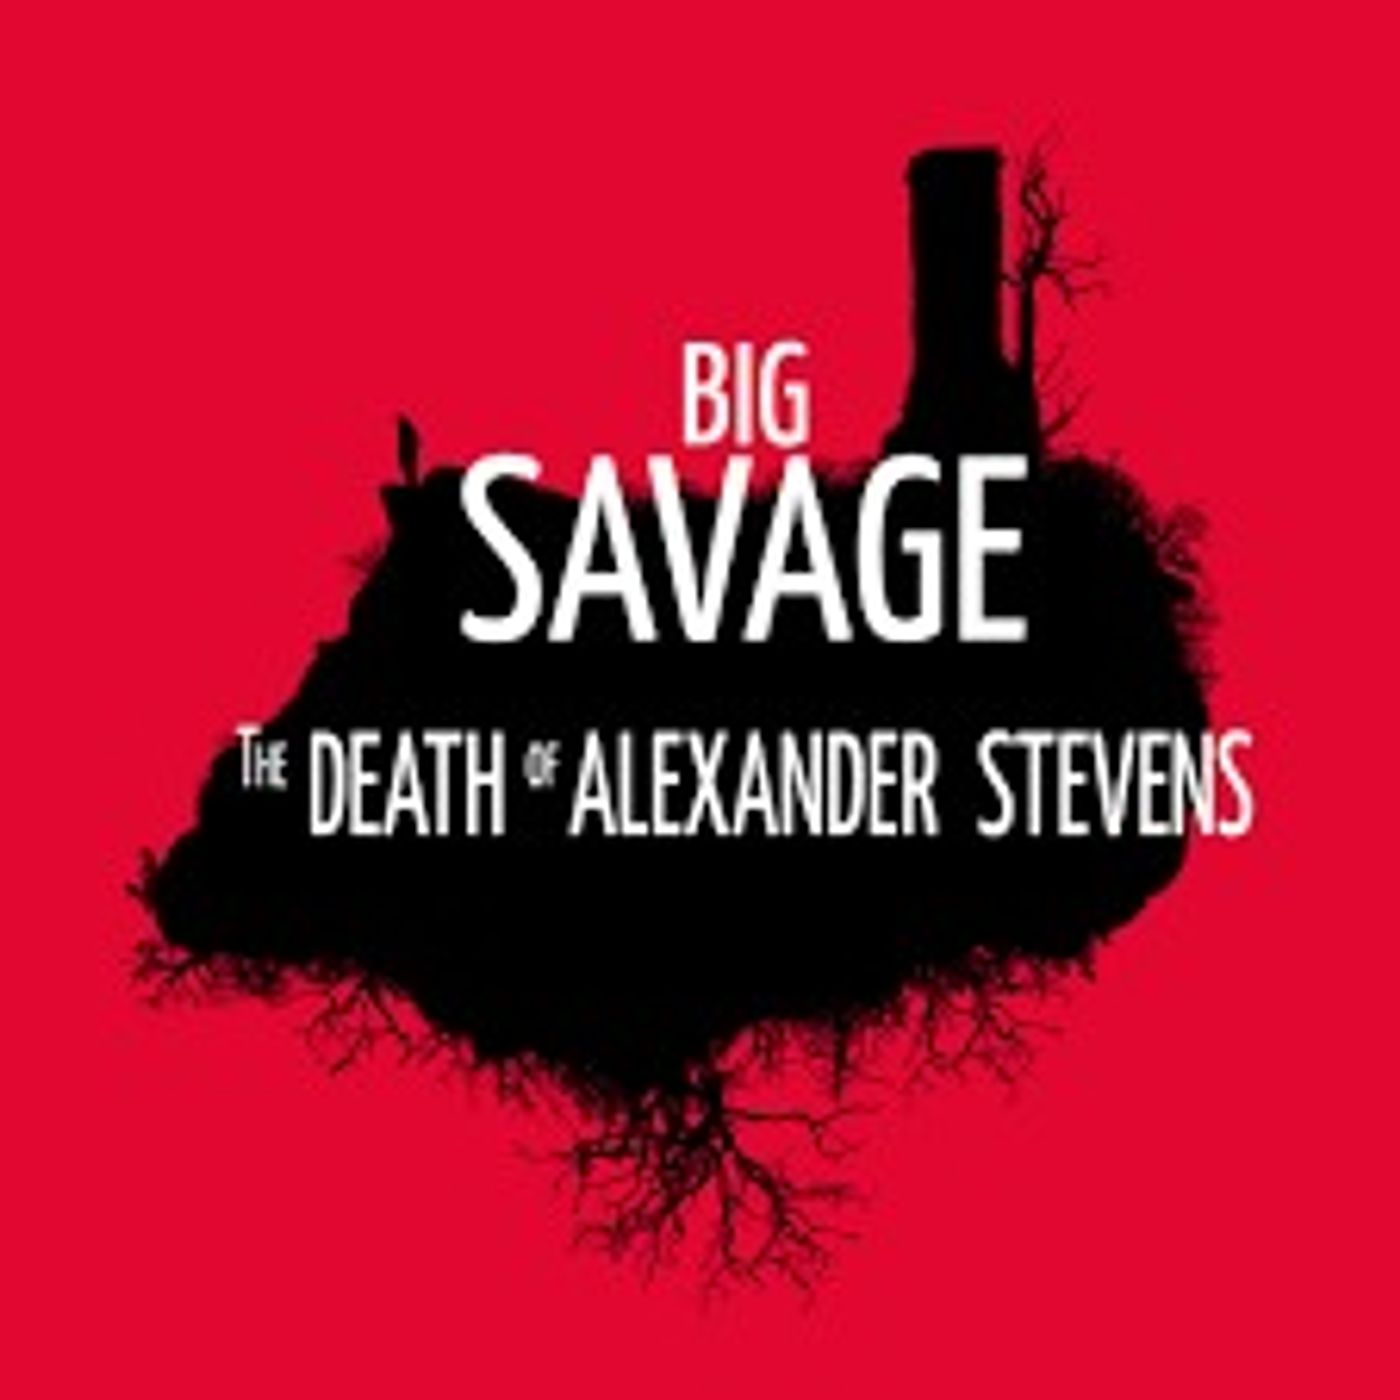 Folie à Deux? | Big Savage: The Death of Alexander Stevens